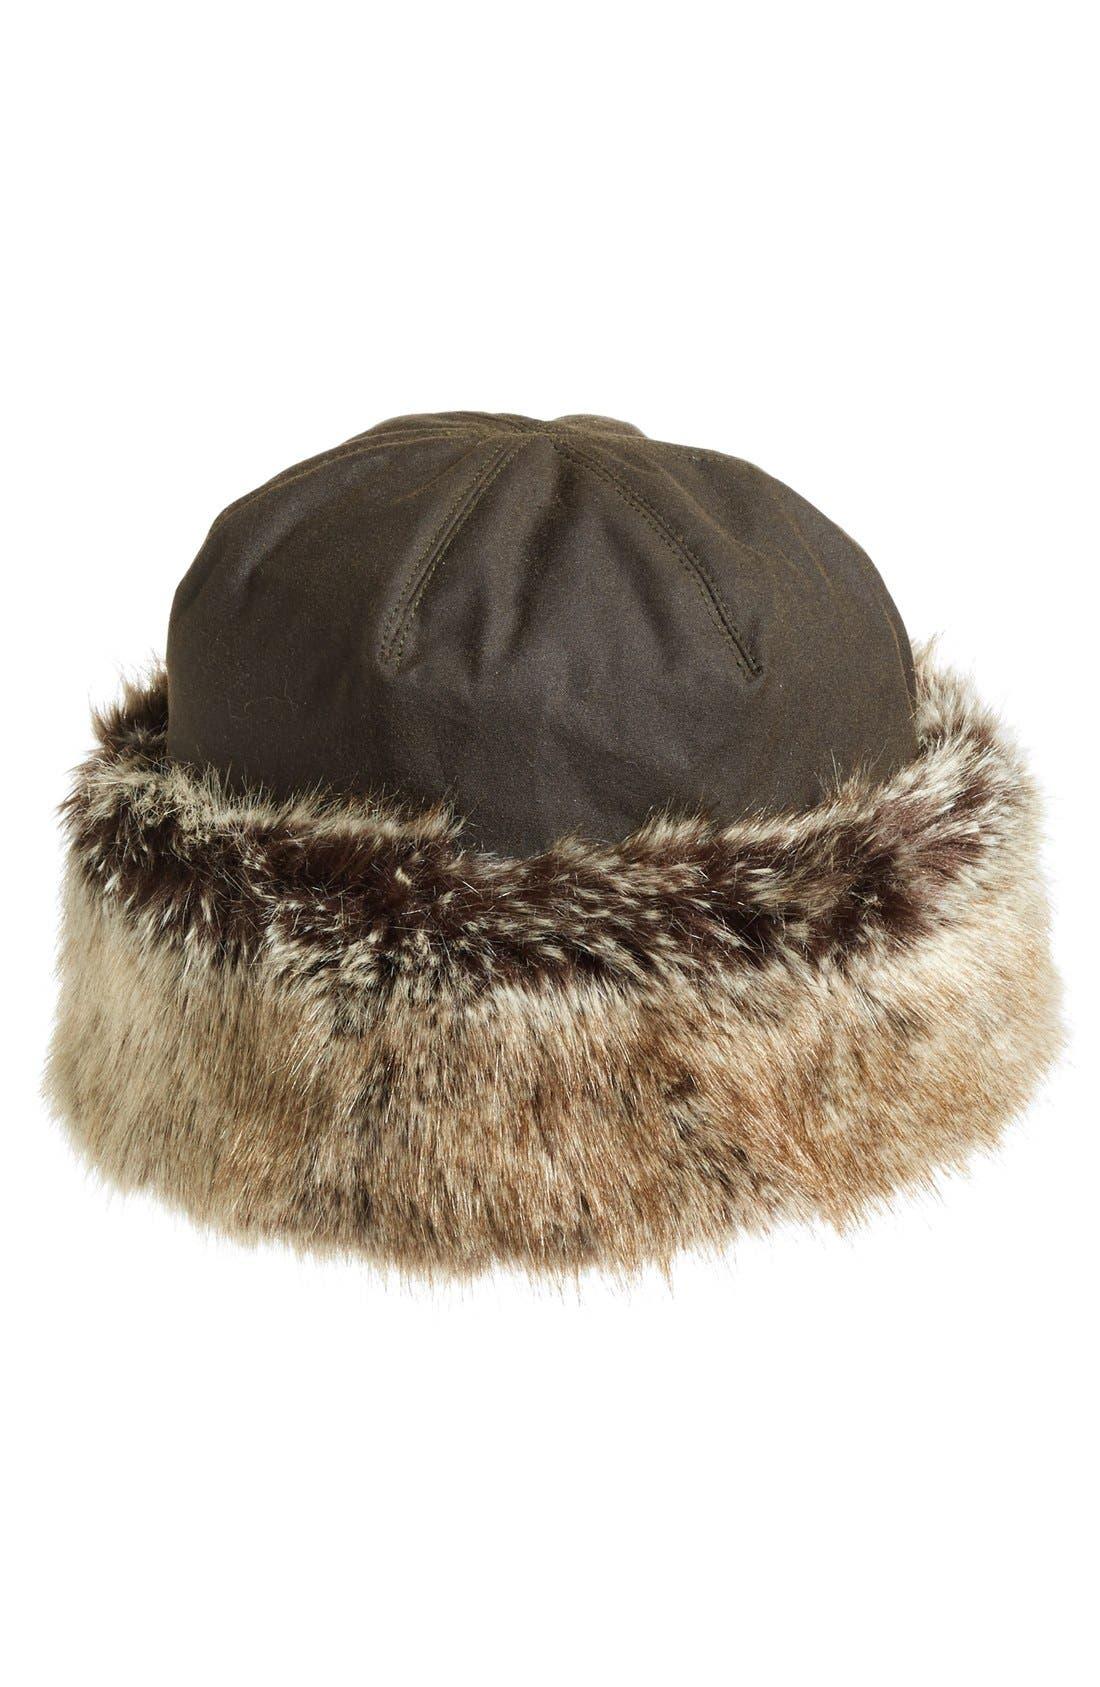 Alternate Image 1 Selected - Barbour 'Ambush' Waxed Cotton Hat with Faux Fur Trim